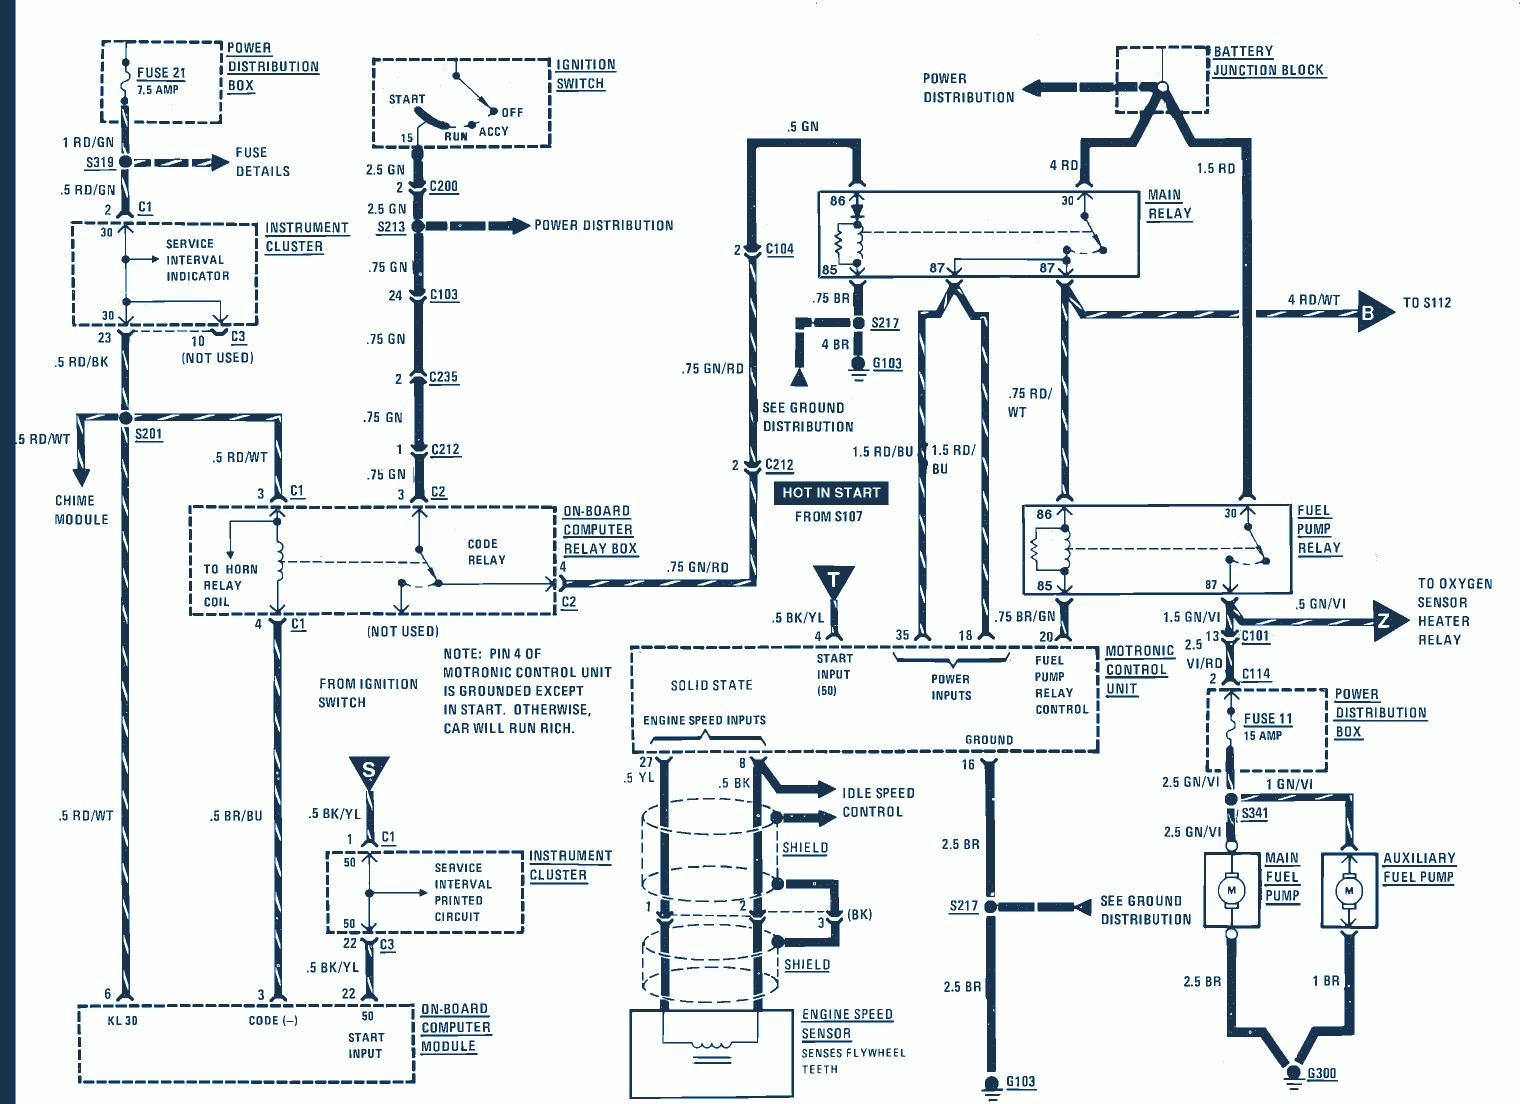 Bmw E39 Tail Light Wiring Diagram : Bmw e tail light wiring diagram stereo